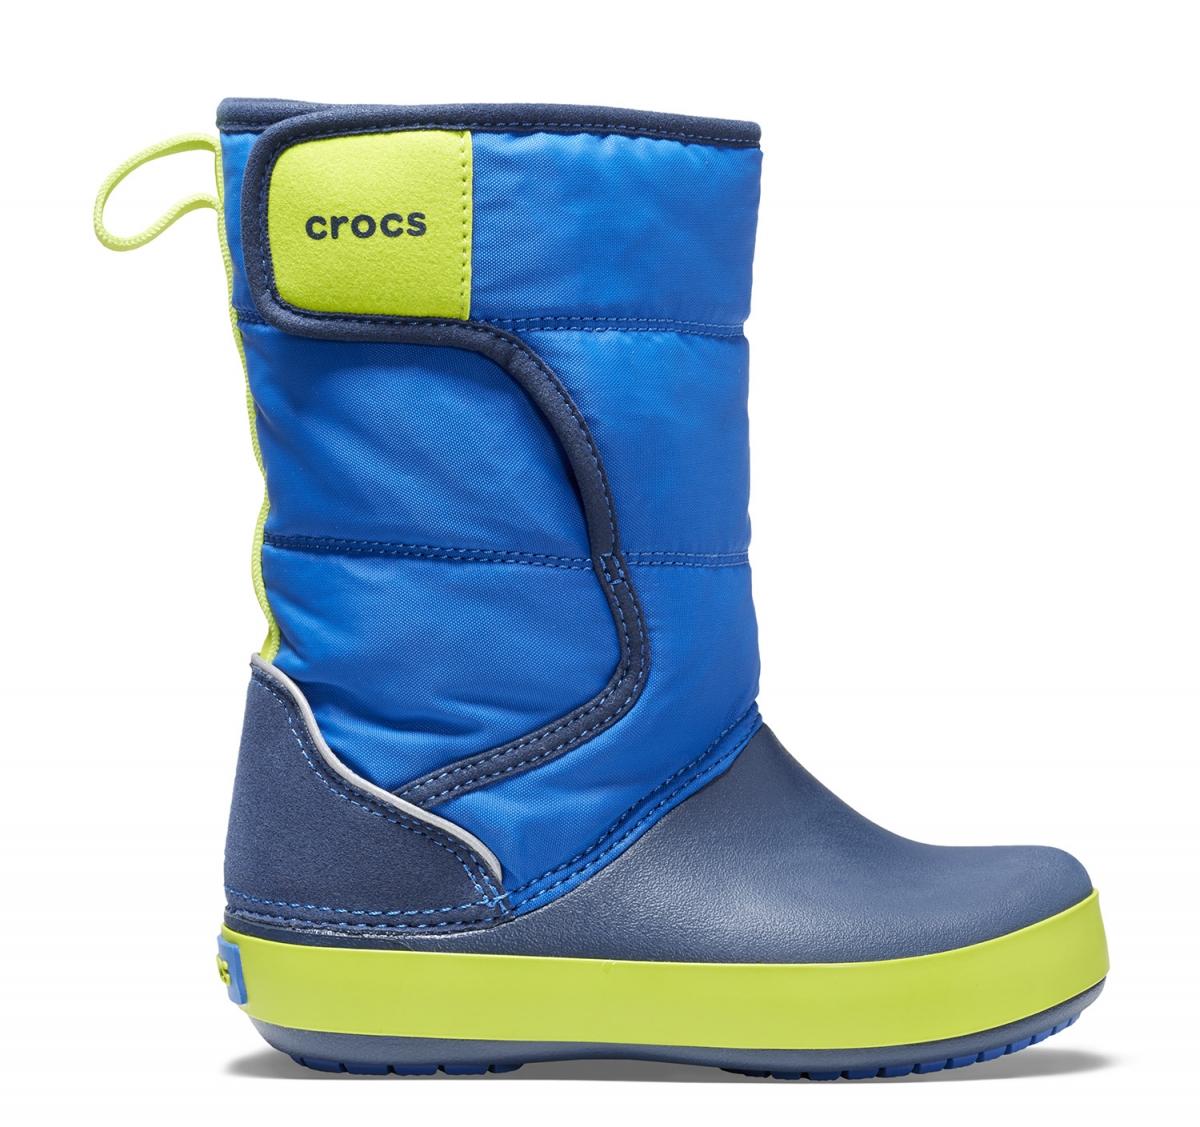 Crocs LodgePoint Snow Boot Kids - Blue Jean/Navy, J2 (33-34)